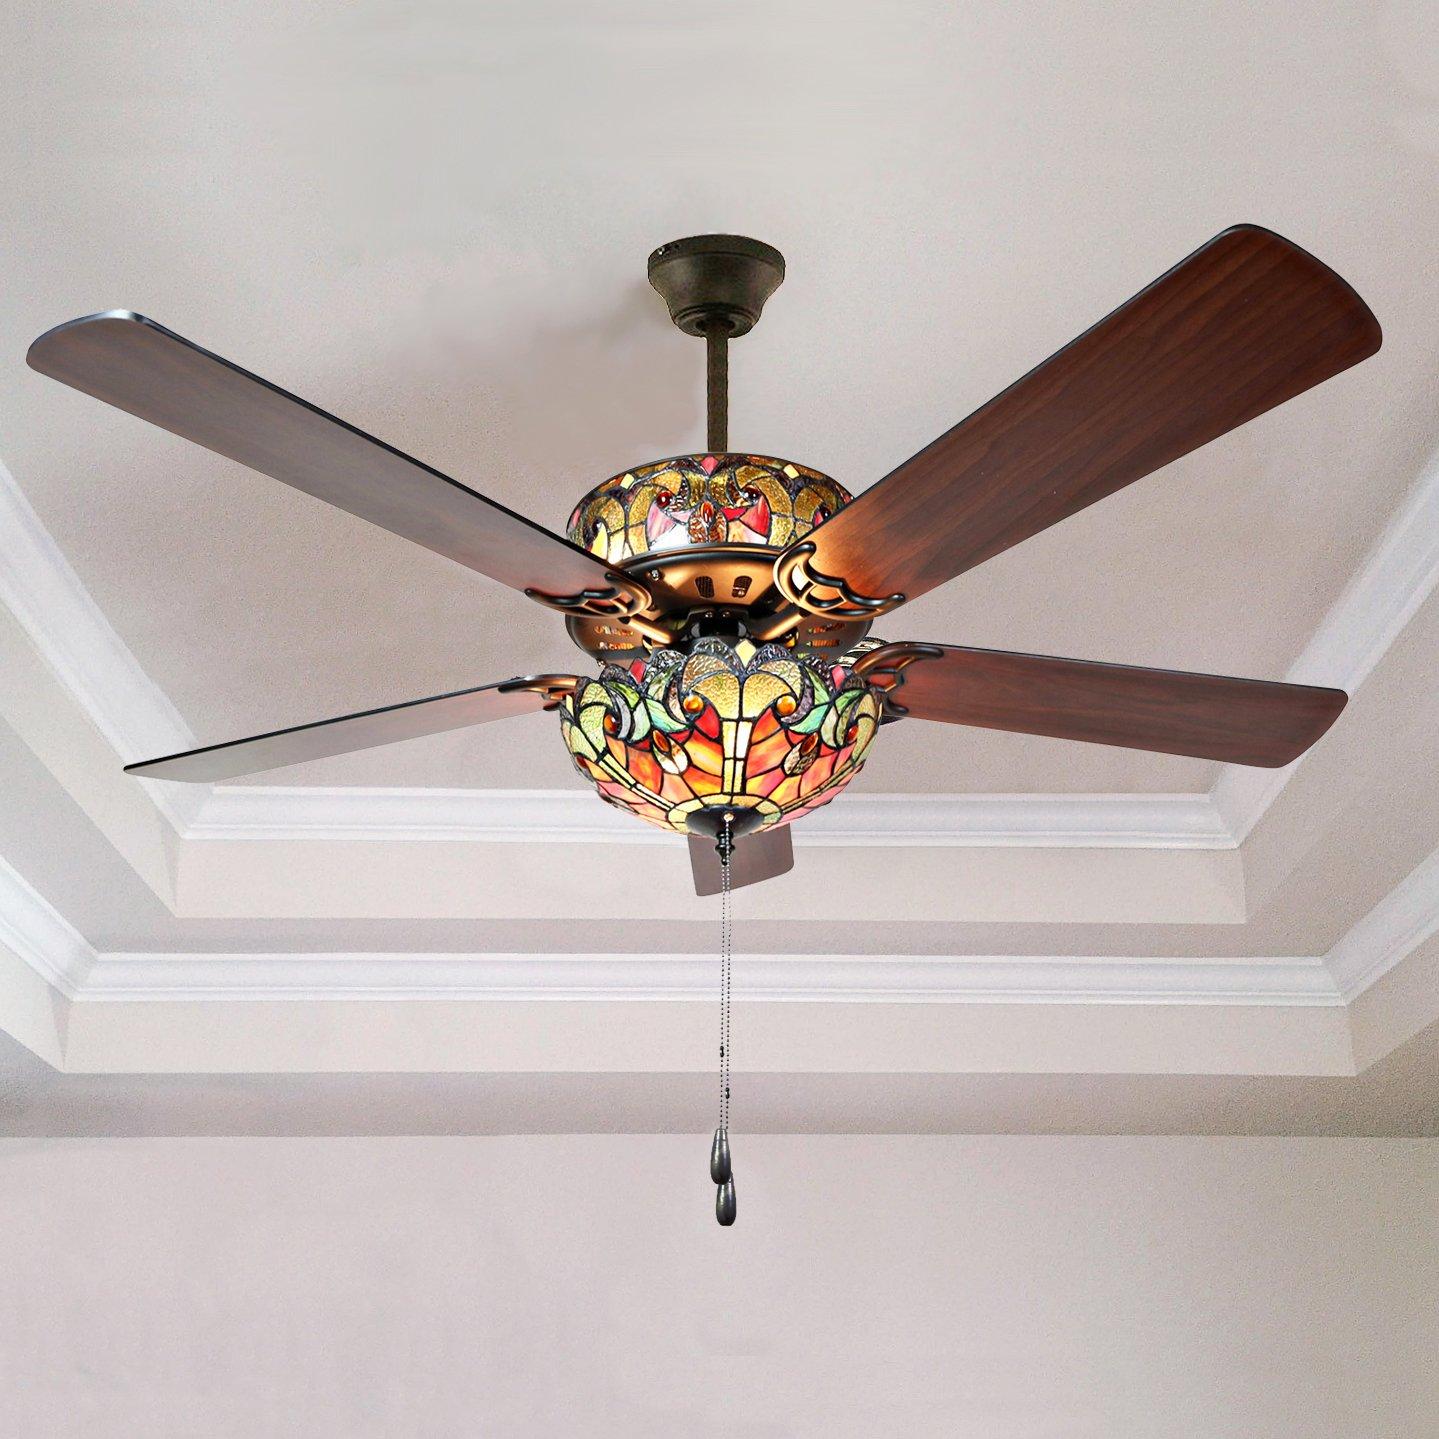 style inch ceiling garden product light doretta tiffany free blade home bowl fan